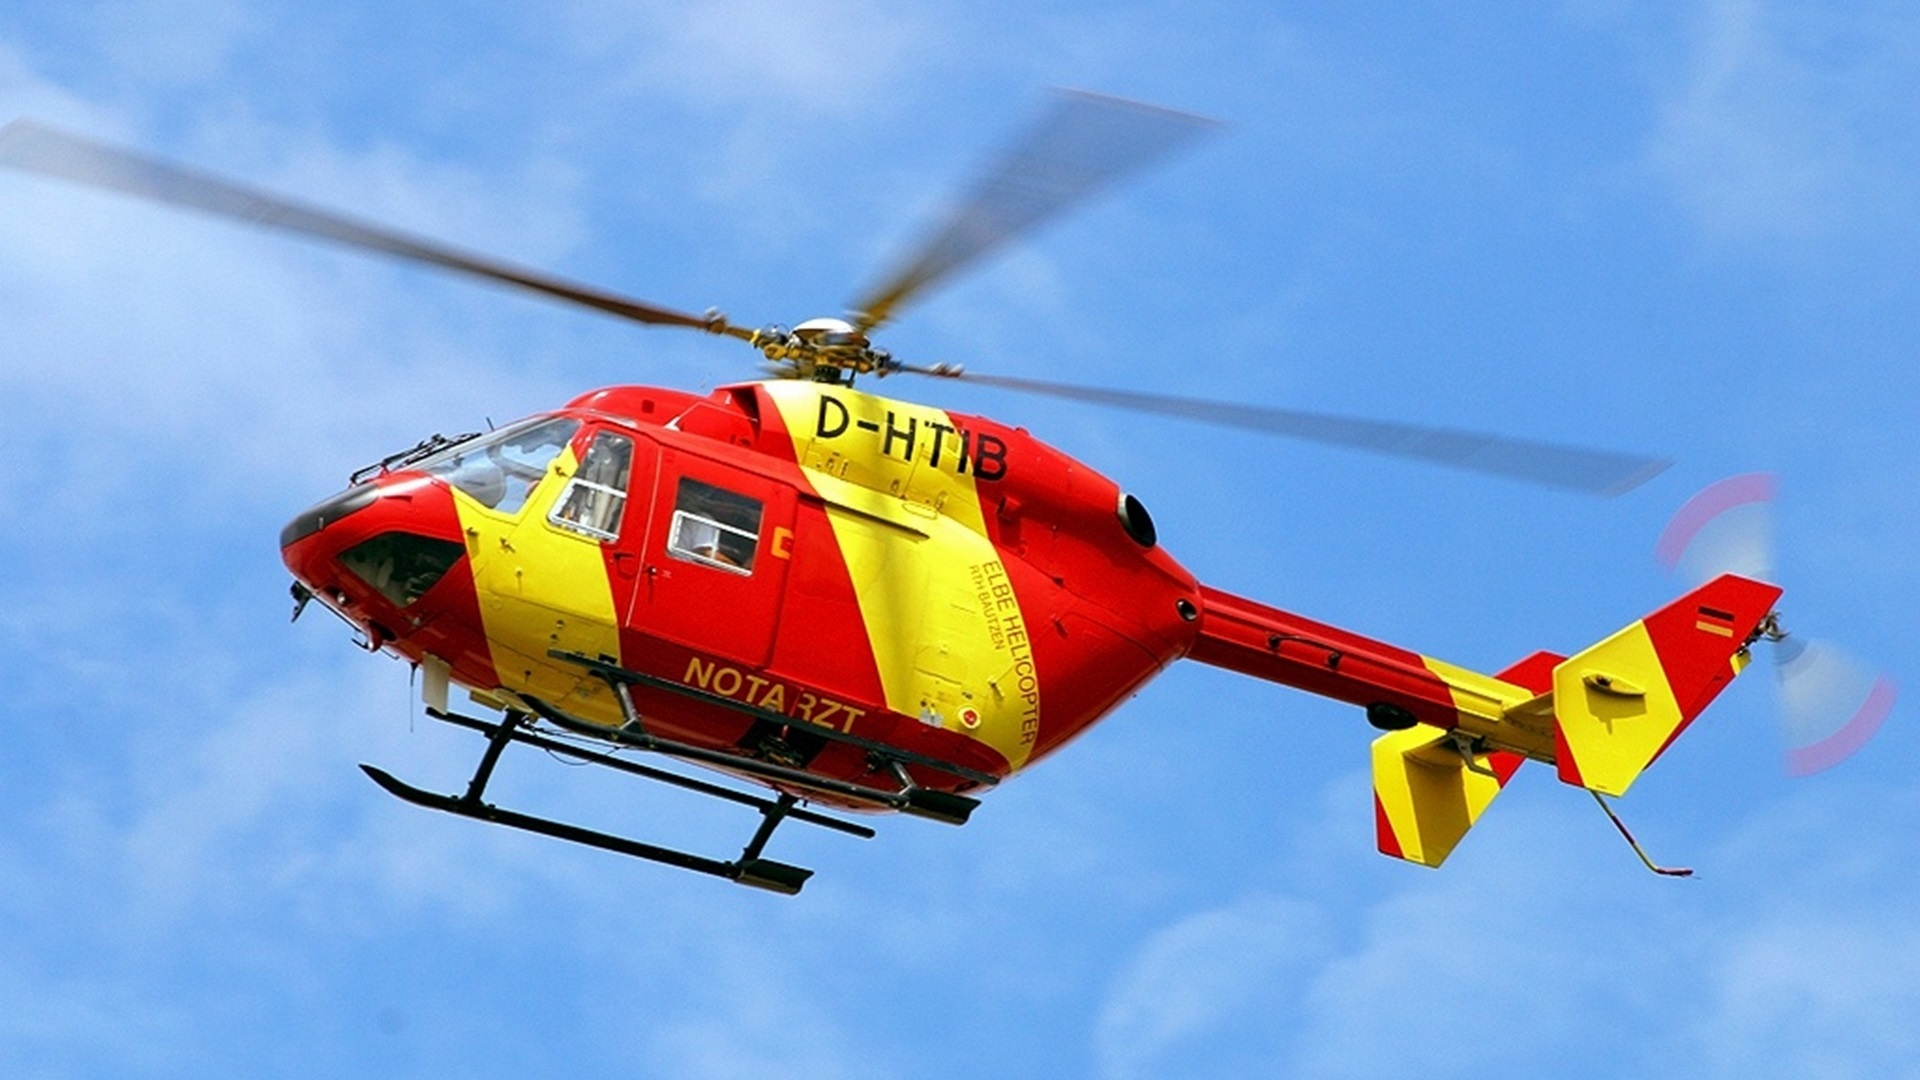 Картинка: Elbe helicopter, вертолёт, красный, жёлтый, винт, лопасти, летит, небо